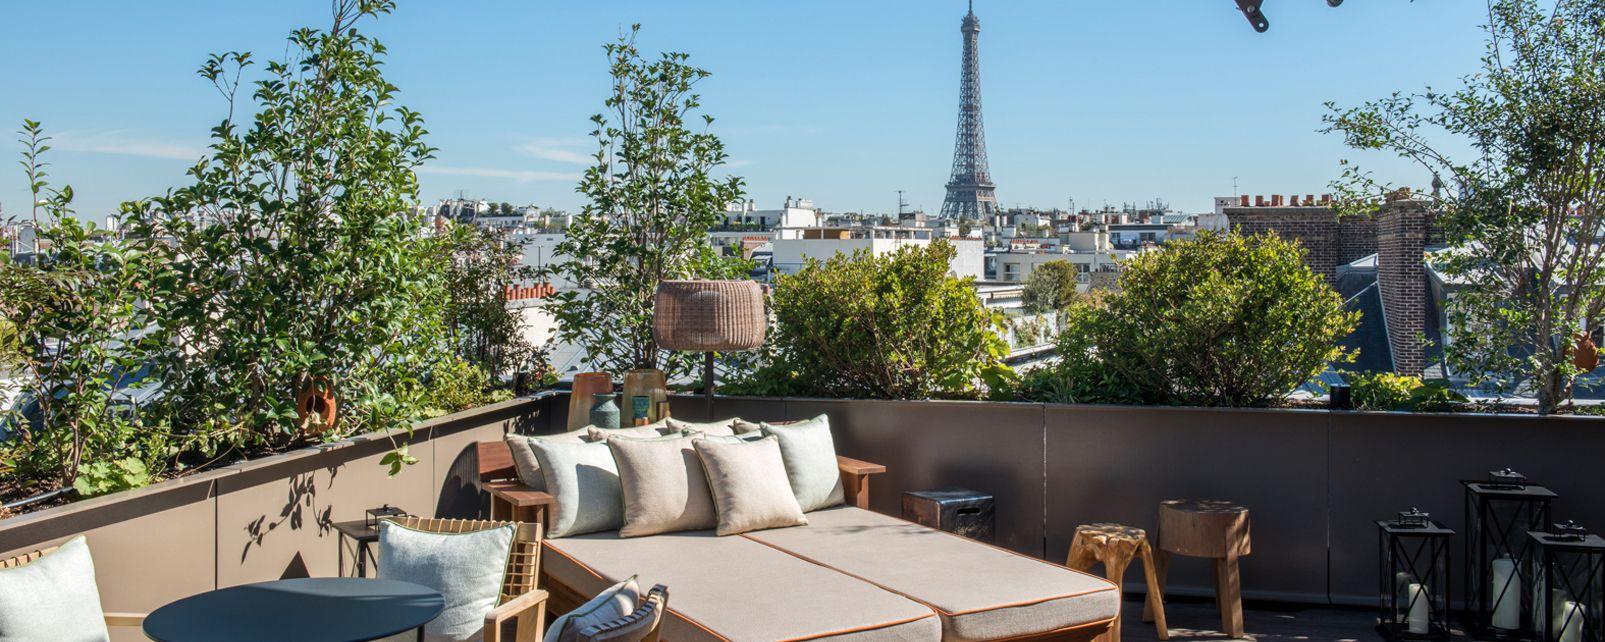 Hôtel Brach Paris